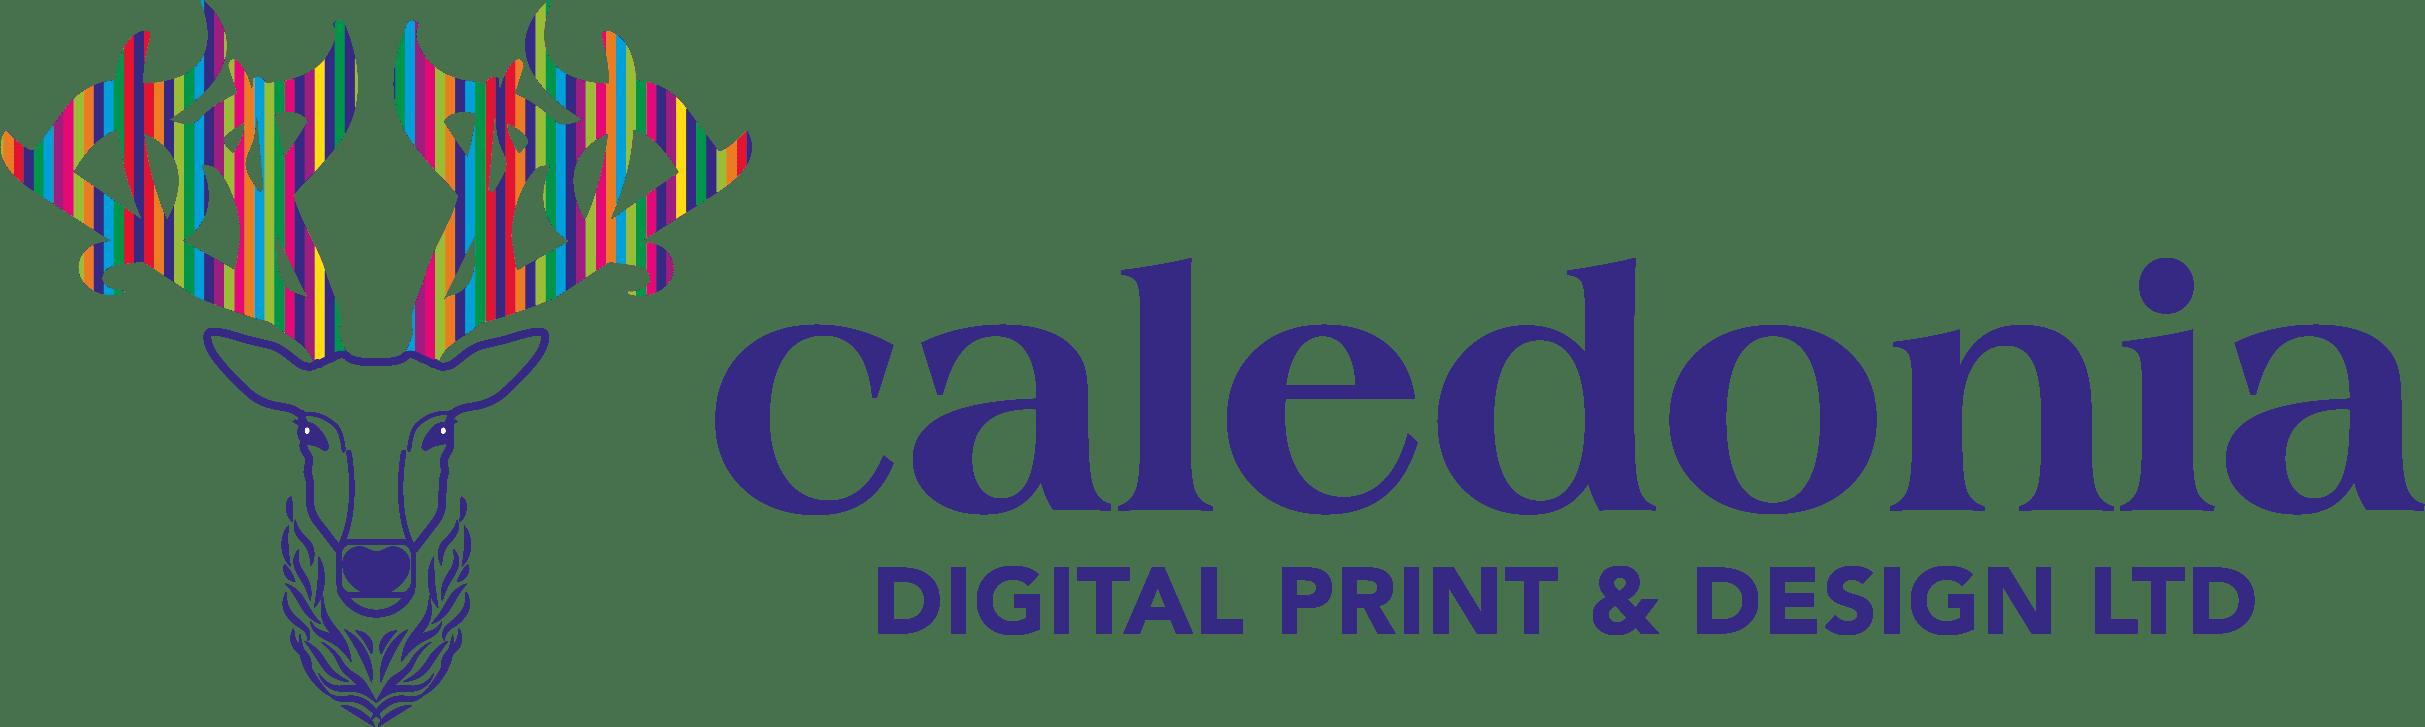 Caledonia Digital Print & Design Ltd